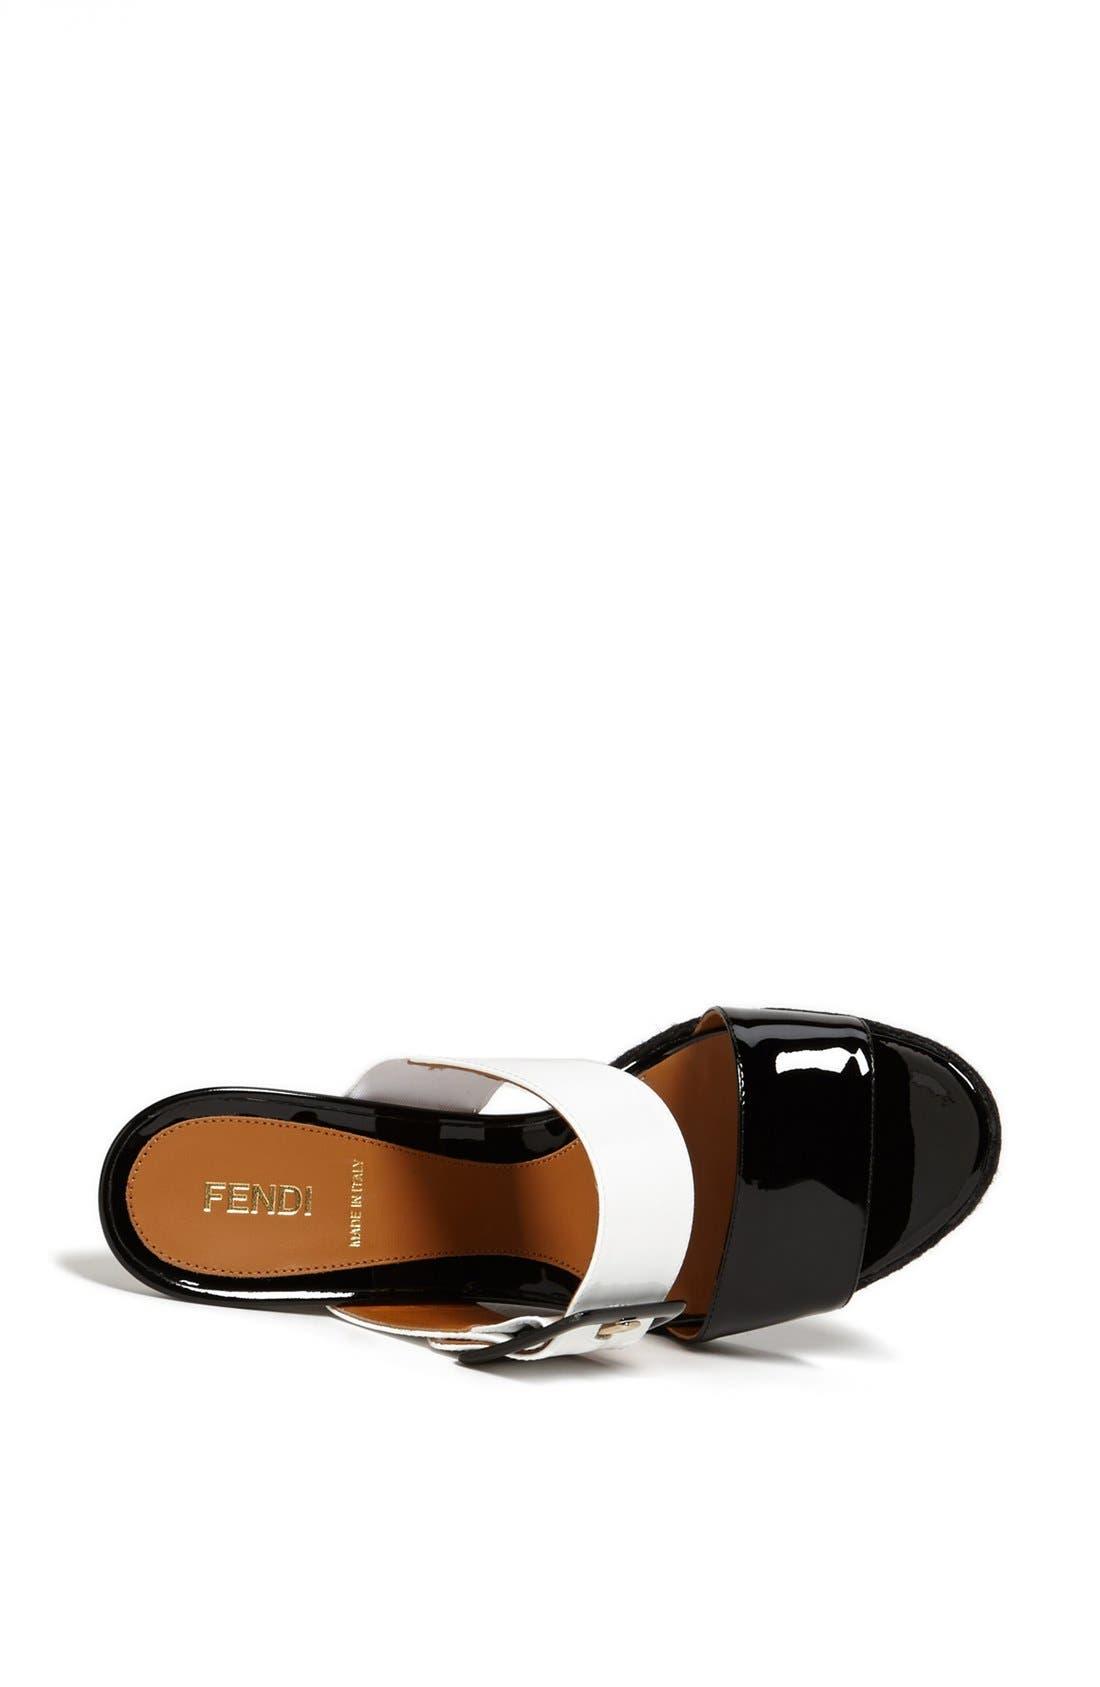 Alternate Image 3  - Fendi 'Vernis' Wedge Sandal